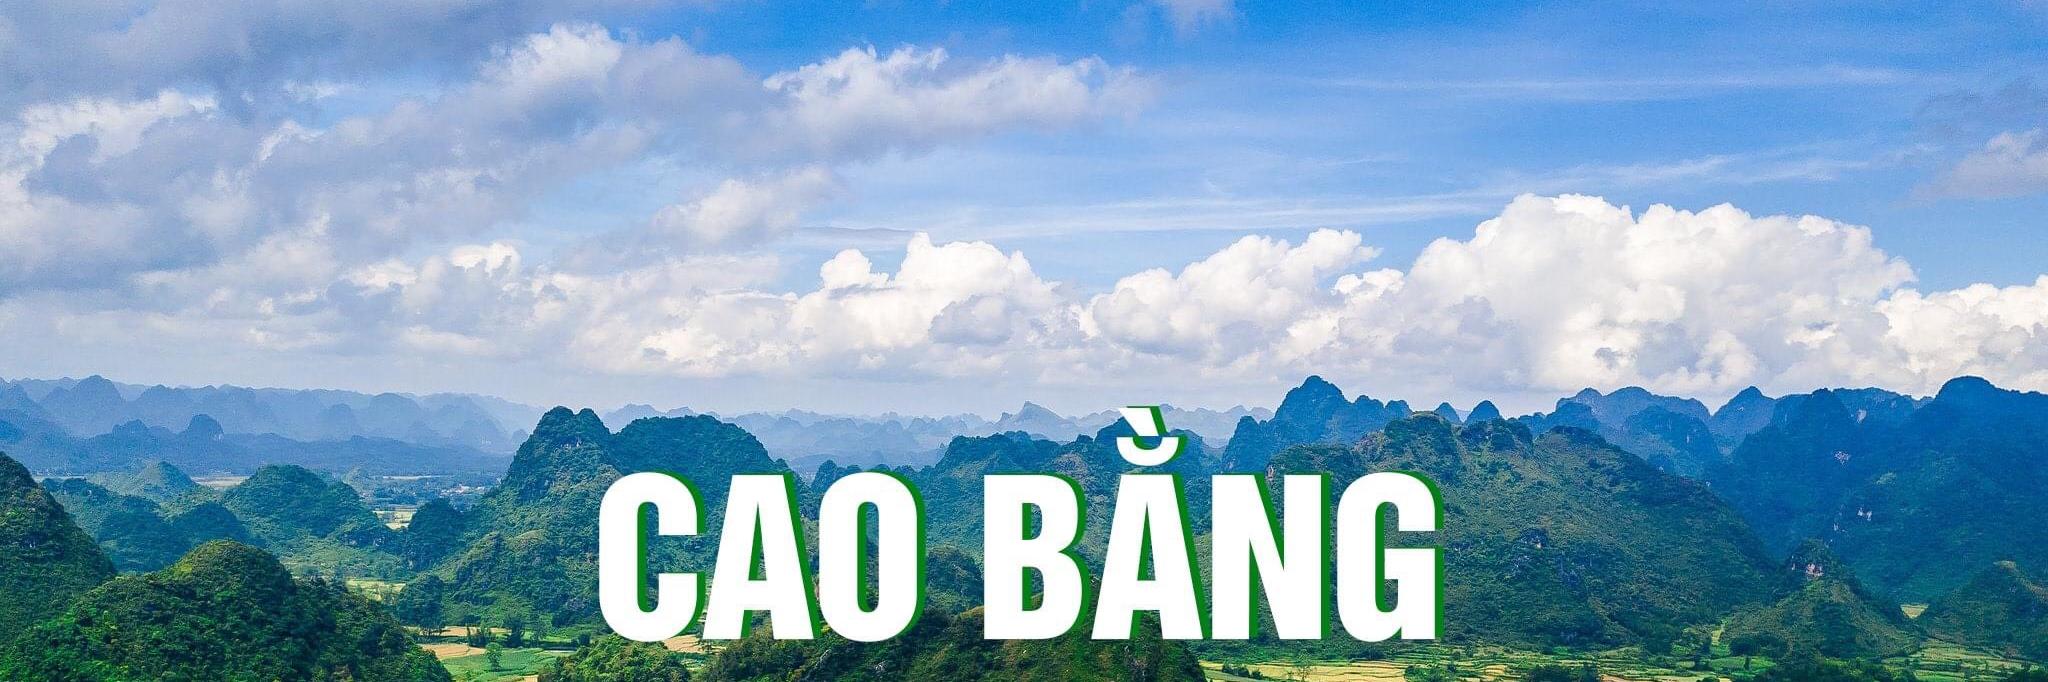 https://gody.vn/blog/12532935681505101494/post/top-16-dia-diem-hap-dan-khong-the-bo-qua-khi-den-cao-bang-7622